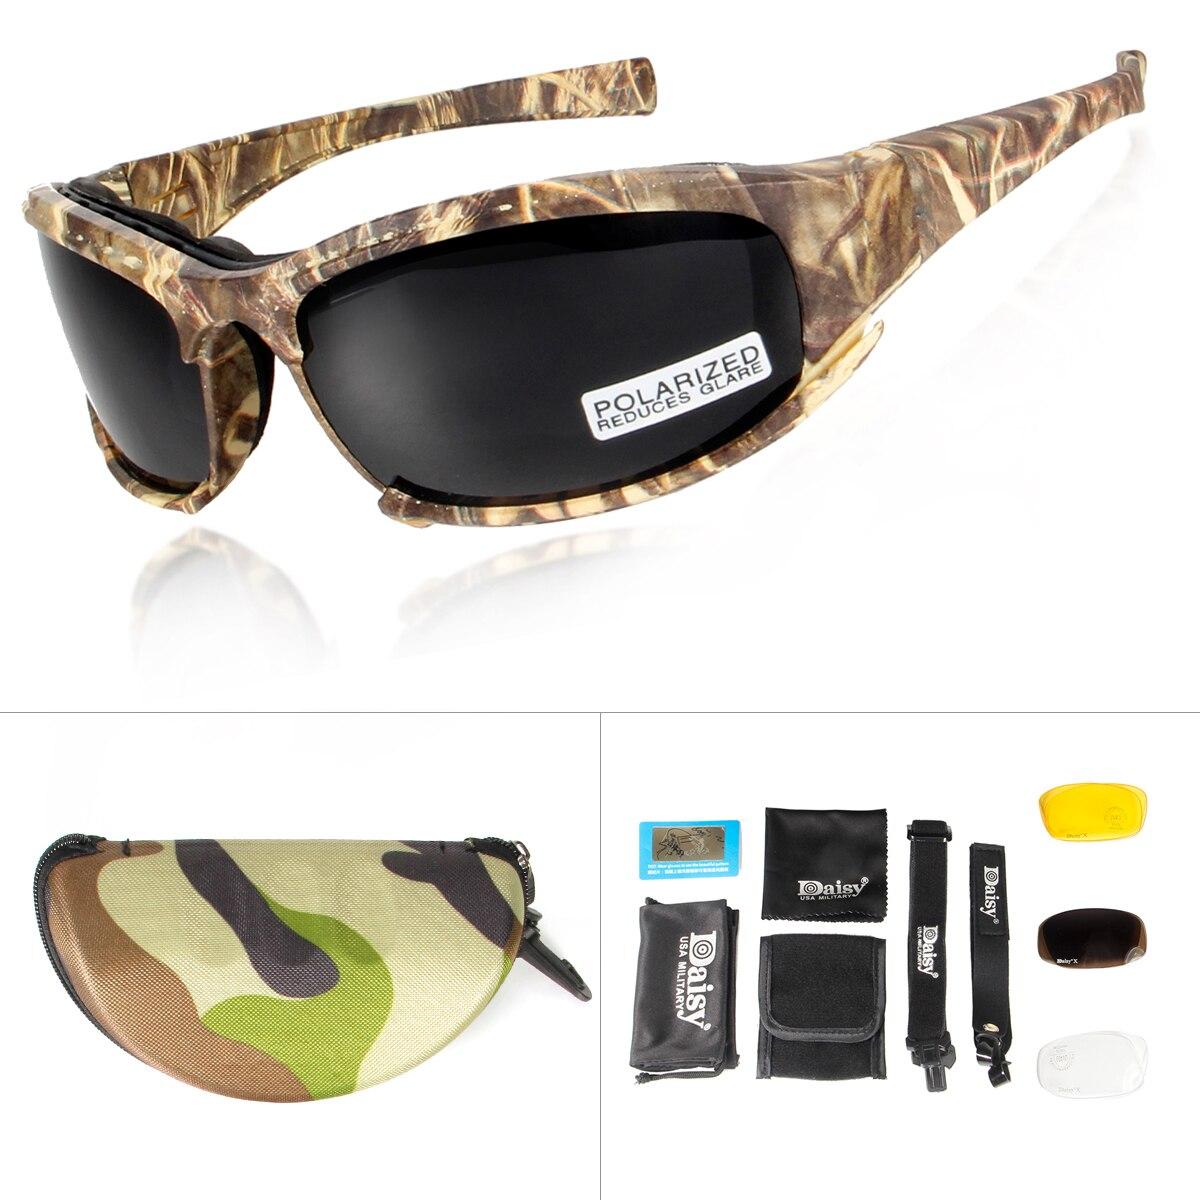 Daisy X7 gafas de camuflaje 4LS hombres gafas de sol polarizadas militares a prueba de balas Airsoft tiro motocicleta gafas de ciclismo